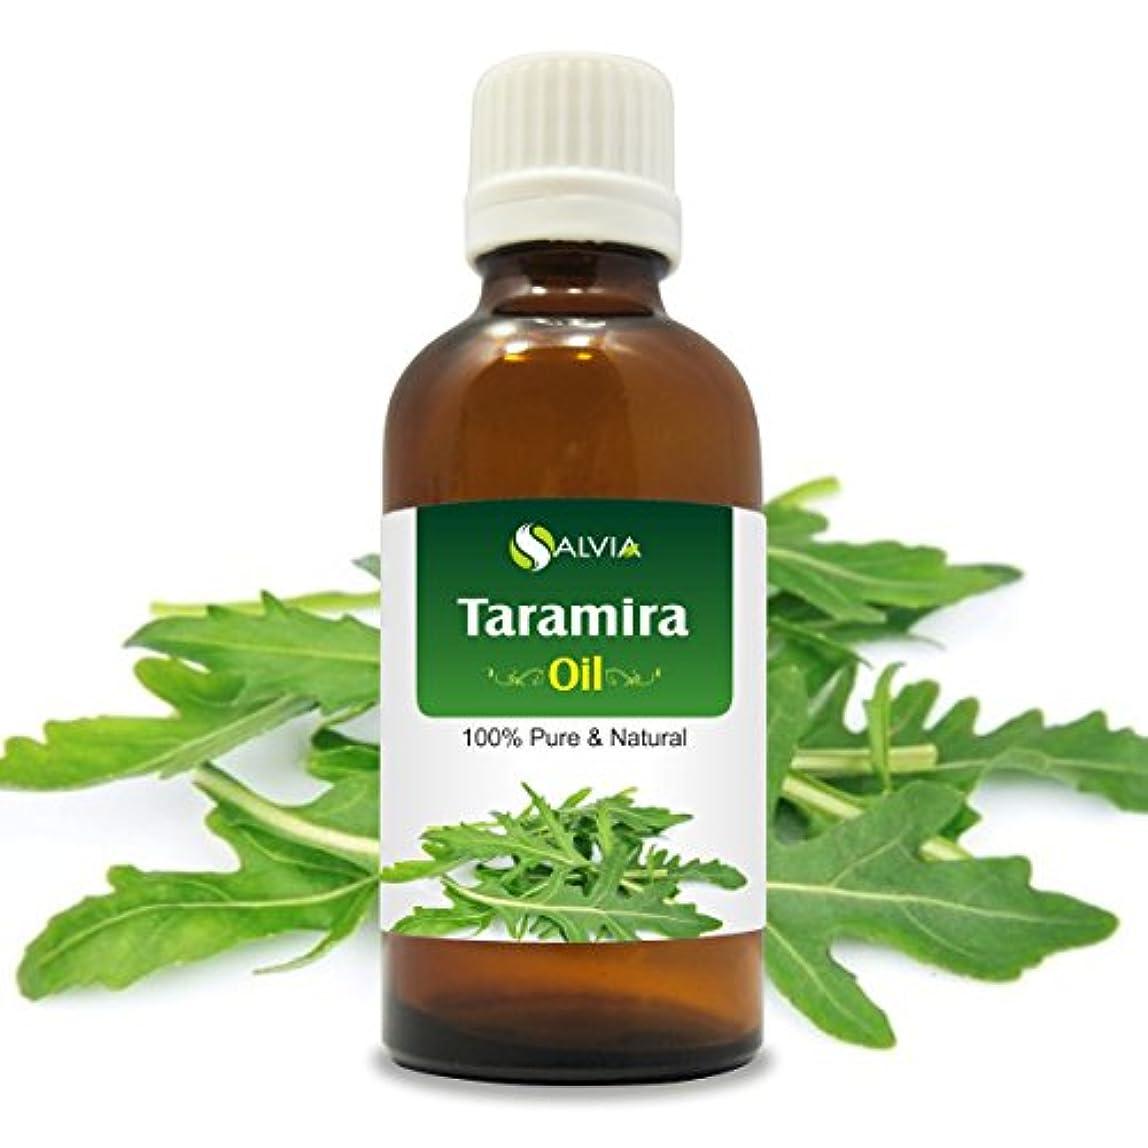 転倒悪党理想的TARAMIRA OIL 100% NATURAL PURE UNDILUTED UNCUT ESSENTIAL OIL 15ML